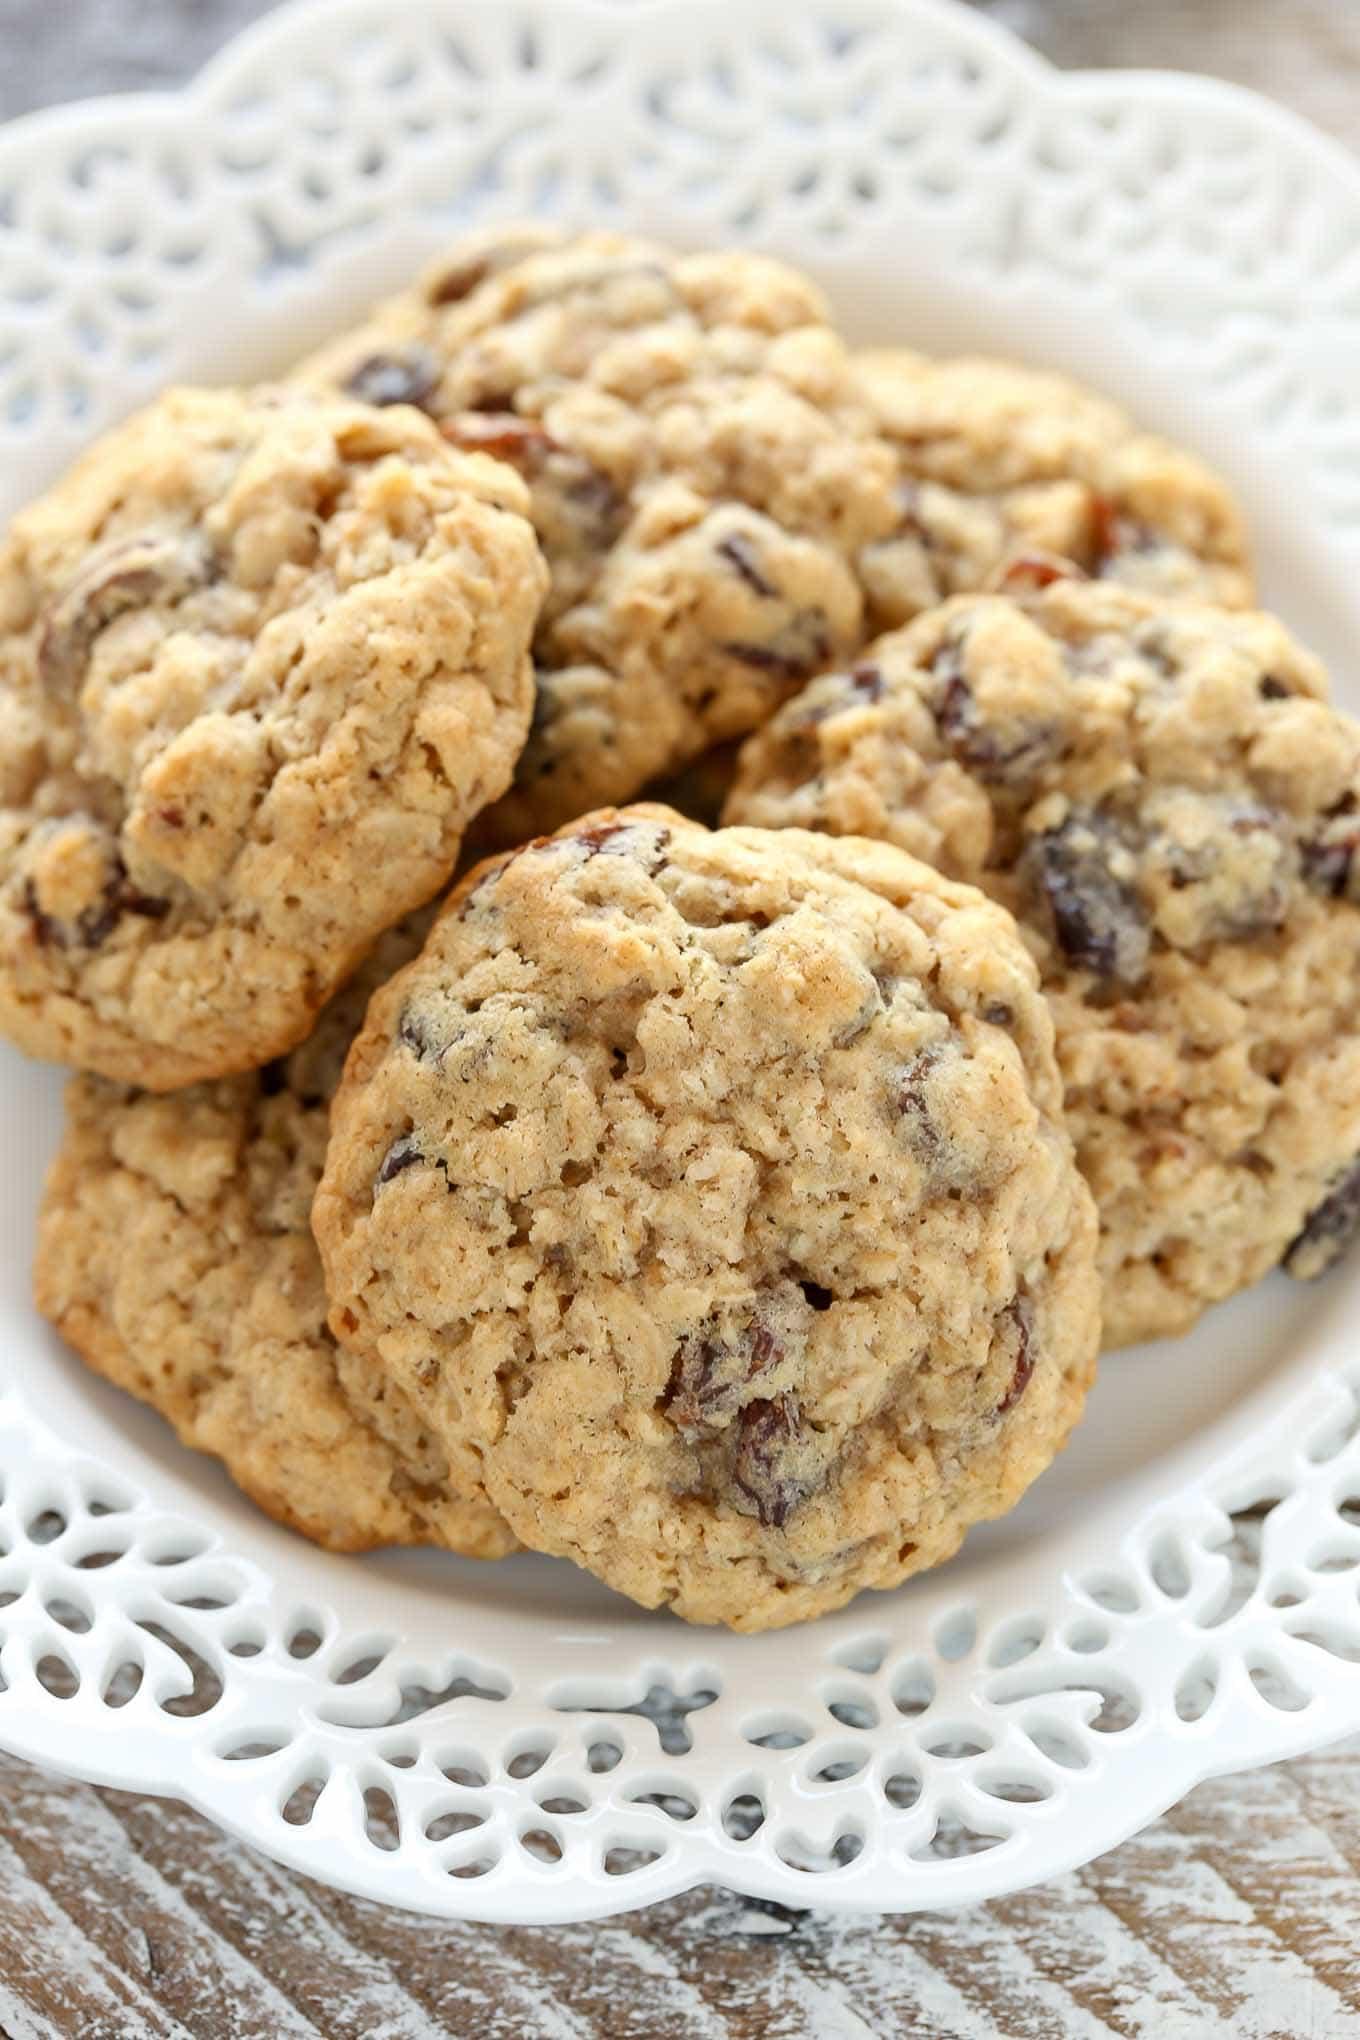 Soft bake oatmeal cookies